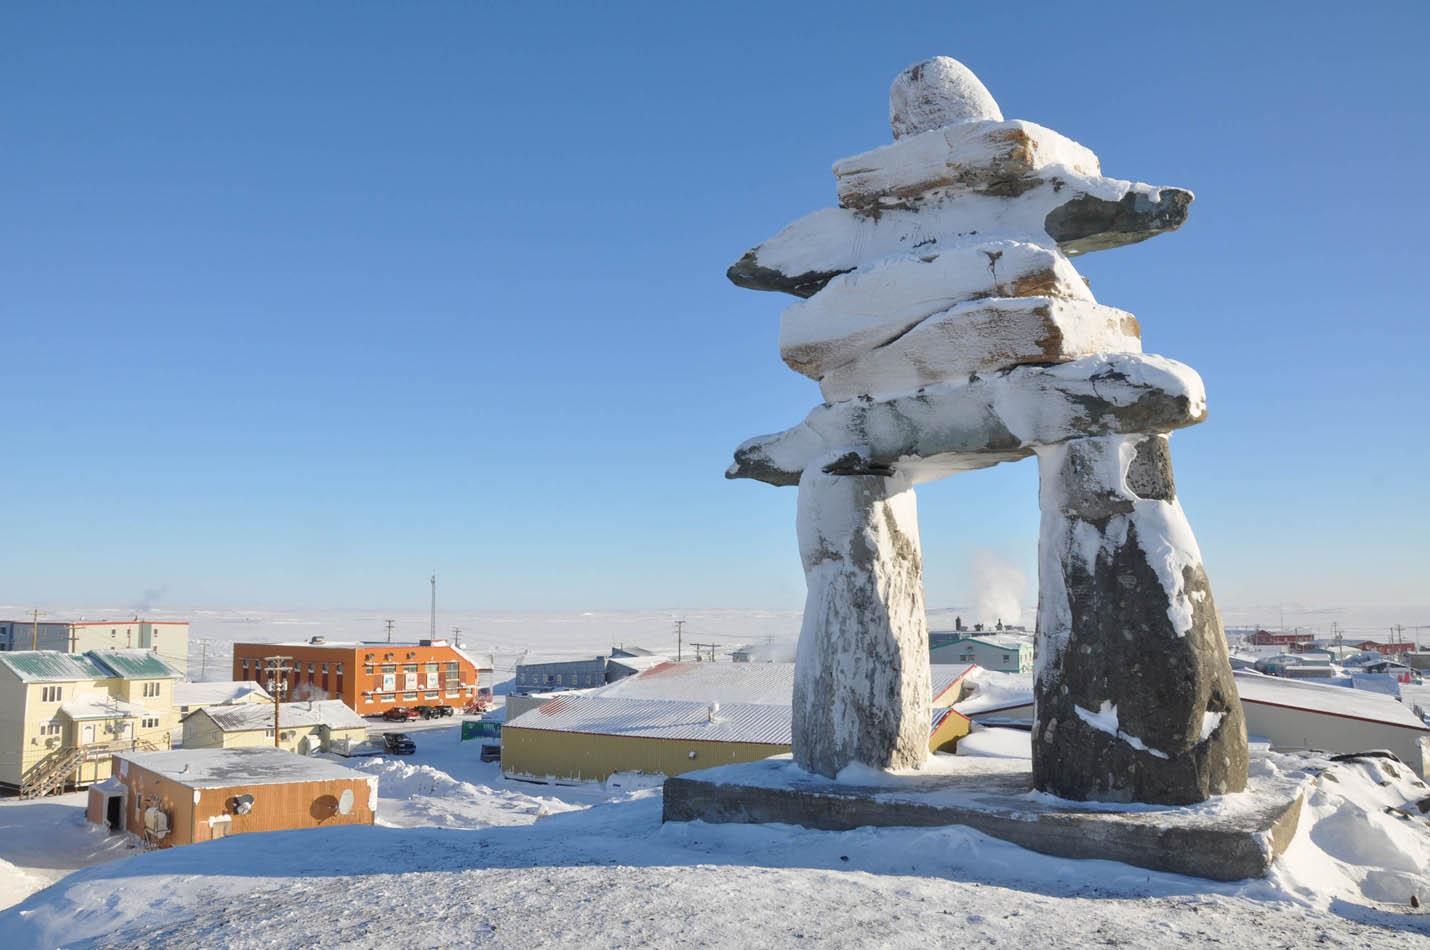 Kivalliq Inuit Association elections delayed due to blizzard | Nunatsiaq News